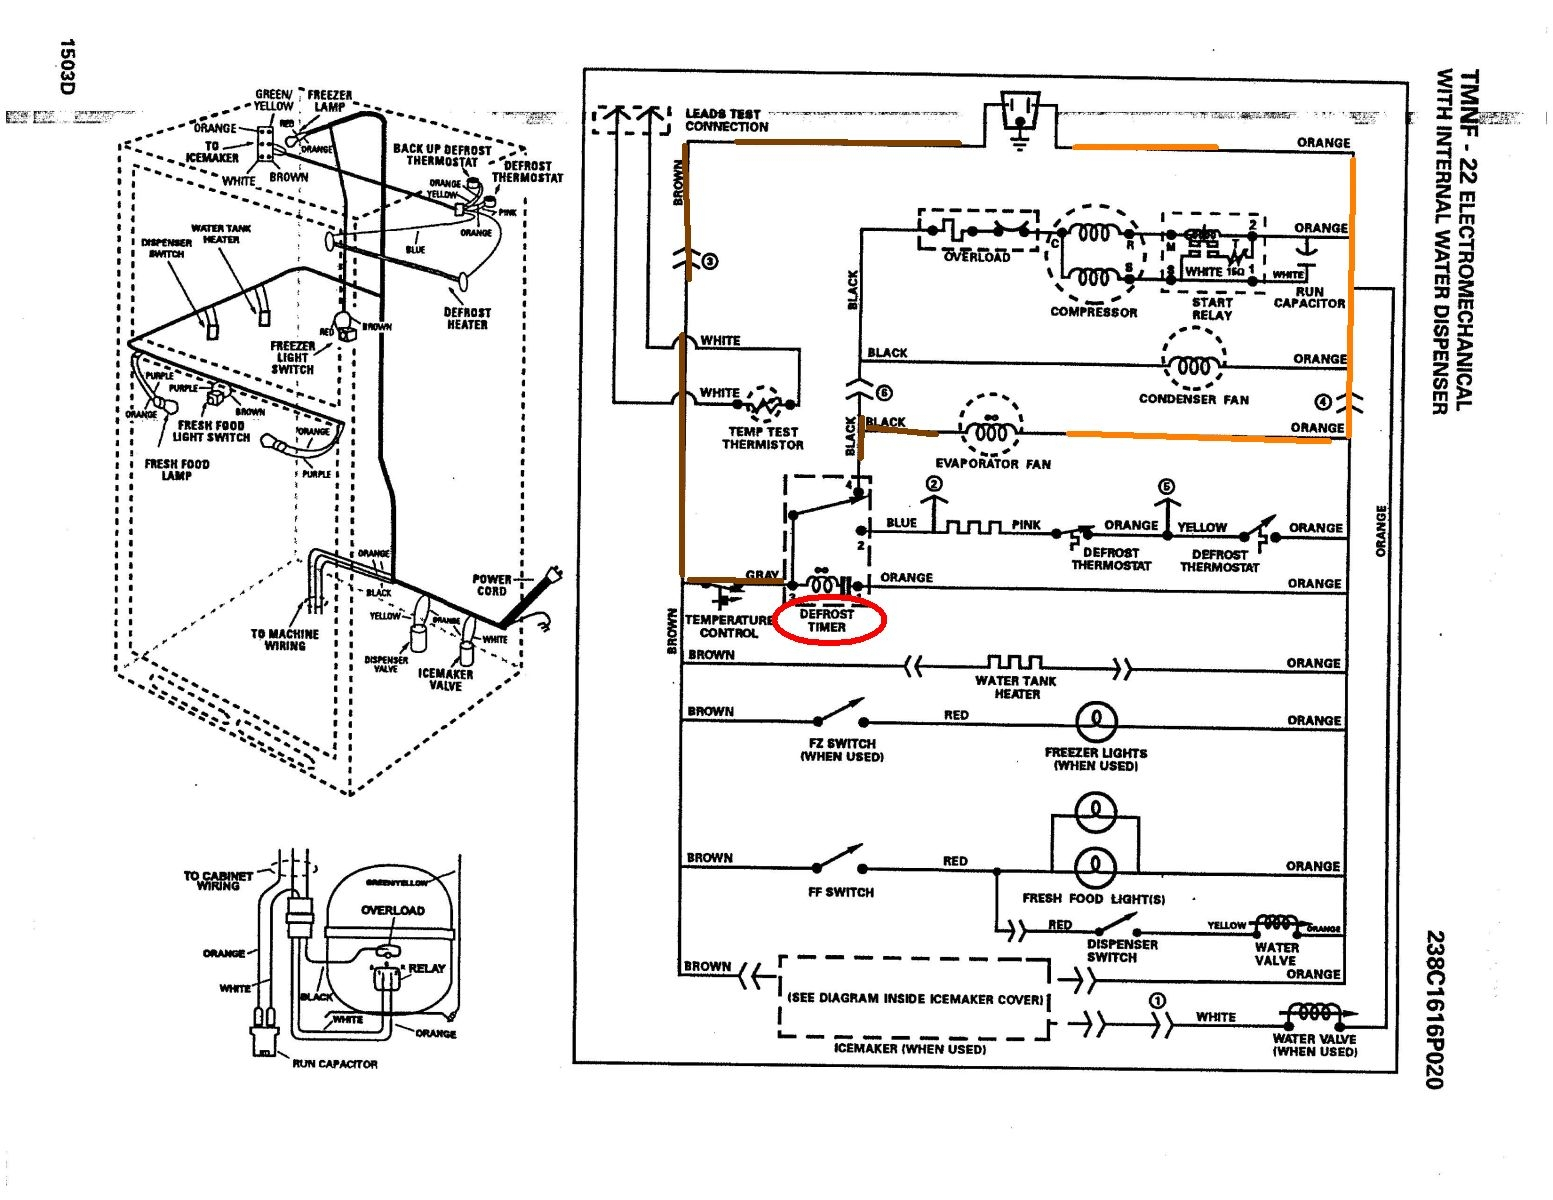 refrigerator wiring diagram collection refrigerator wiring diagram